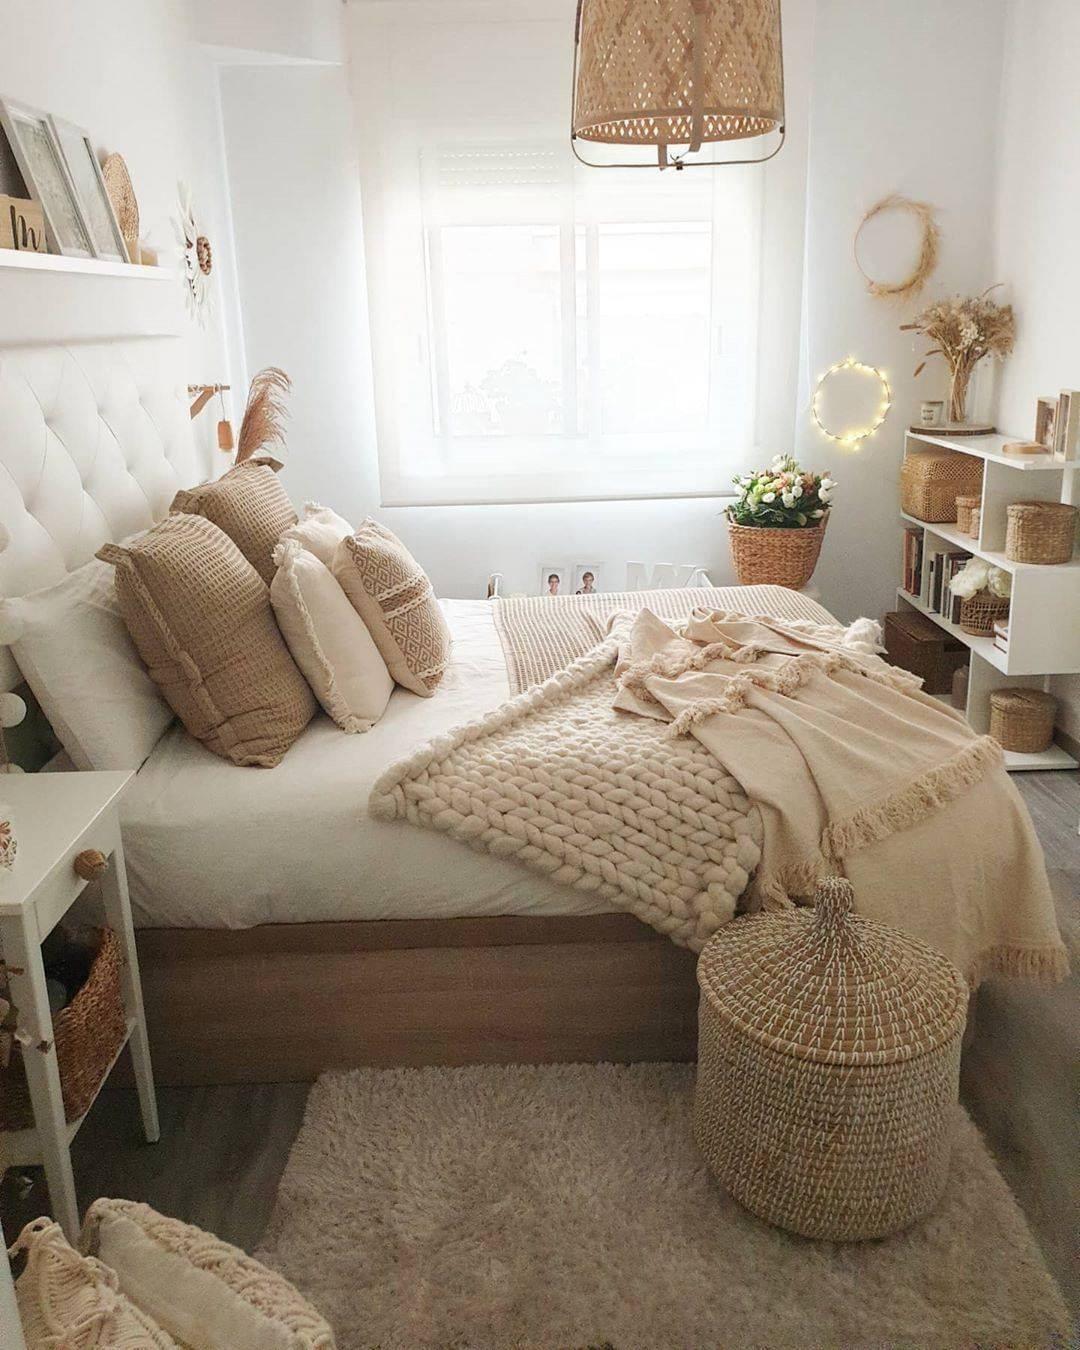 "Home with rue on Instagram: ""Too lovely 😍 via @martadecosweethome_ . . . . - - - - #homewithrue #scandiliving #bedroomdecor #bed #bedroomgoals #bedroomdesign…"""